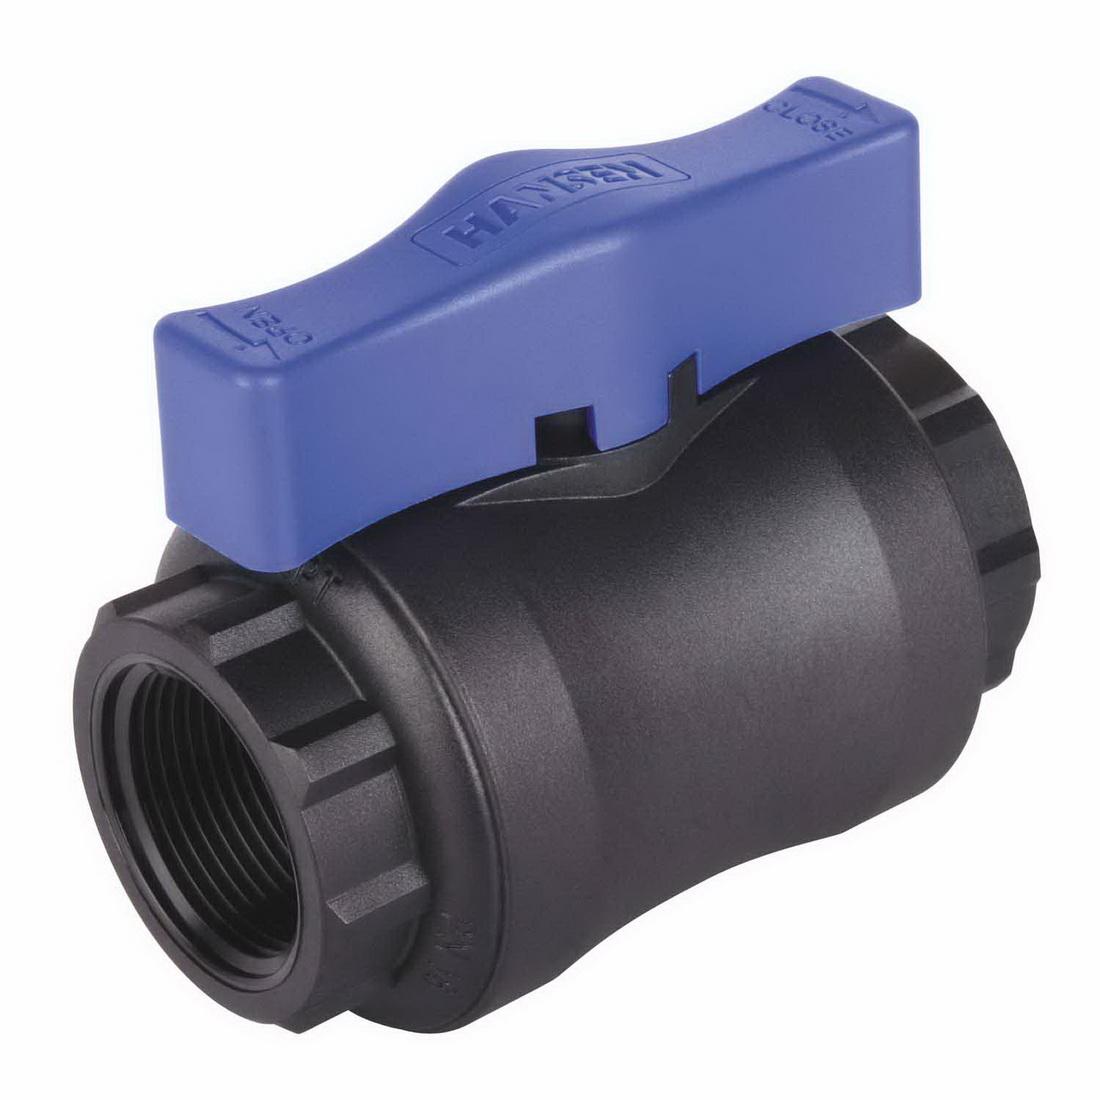 HBV Series Full Flow Compact Ball Valve 20mm F BSPT Glass Fibre Reinforced Nylon Black/Blue